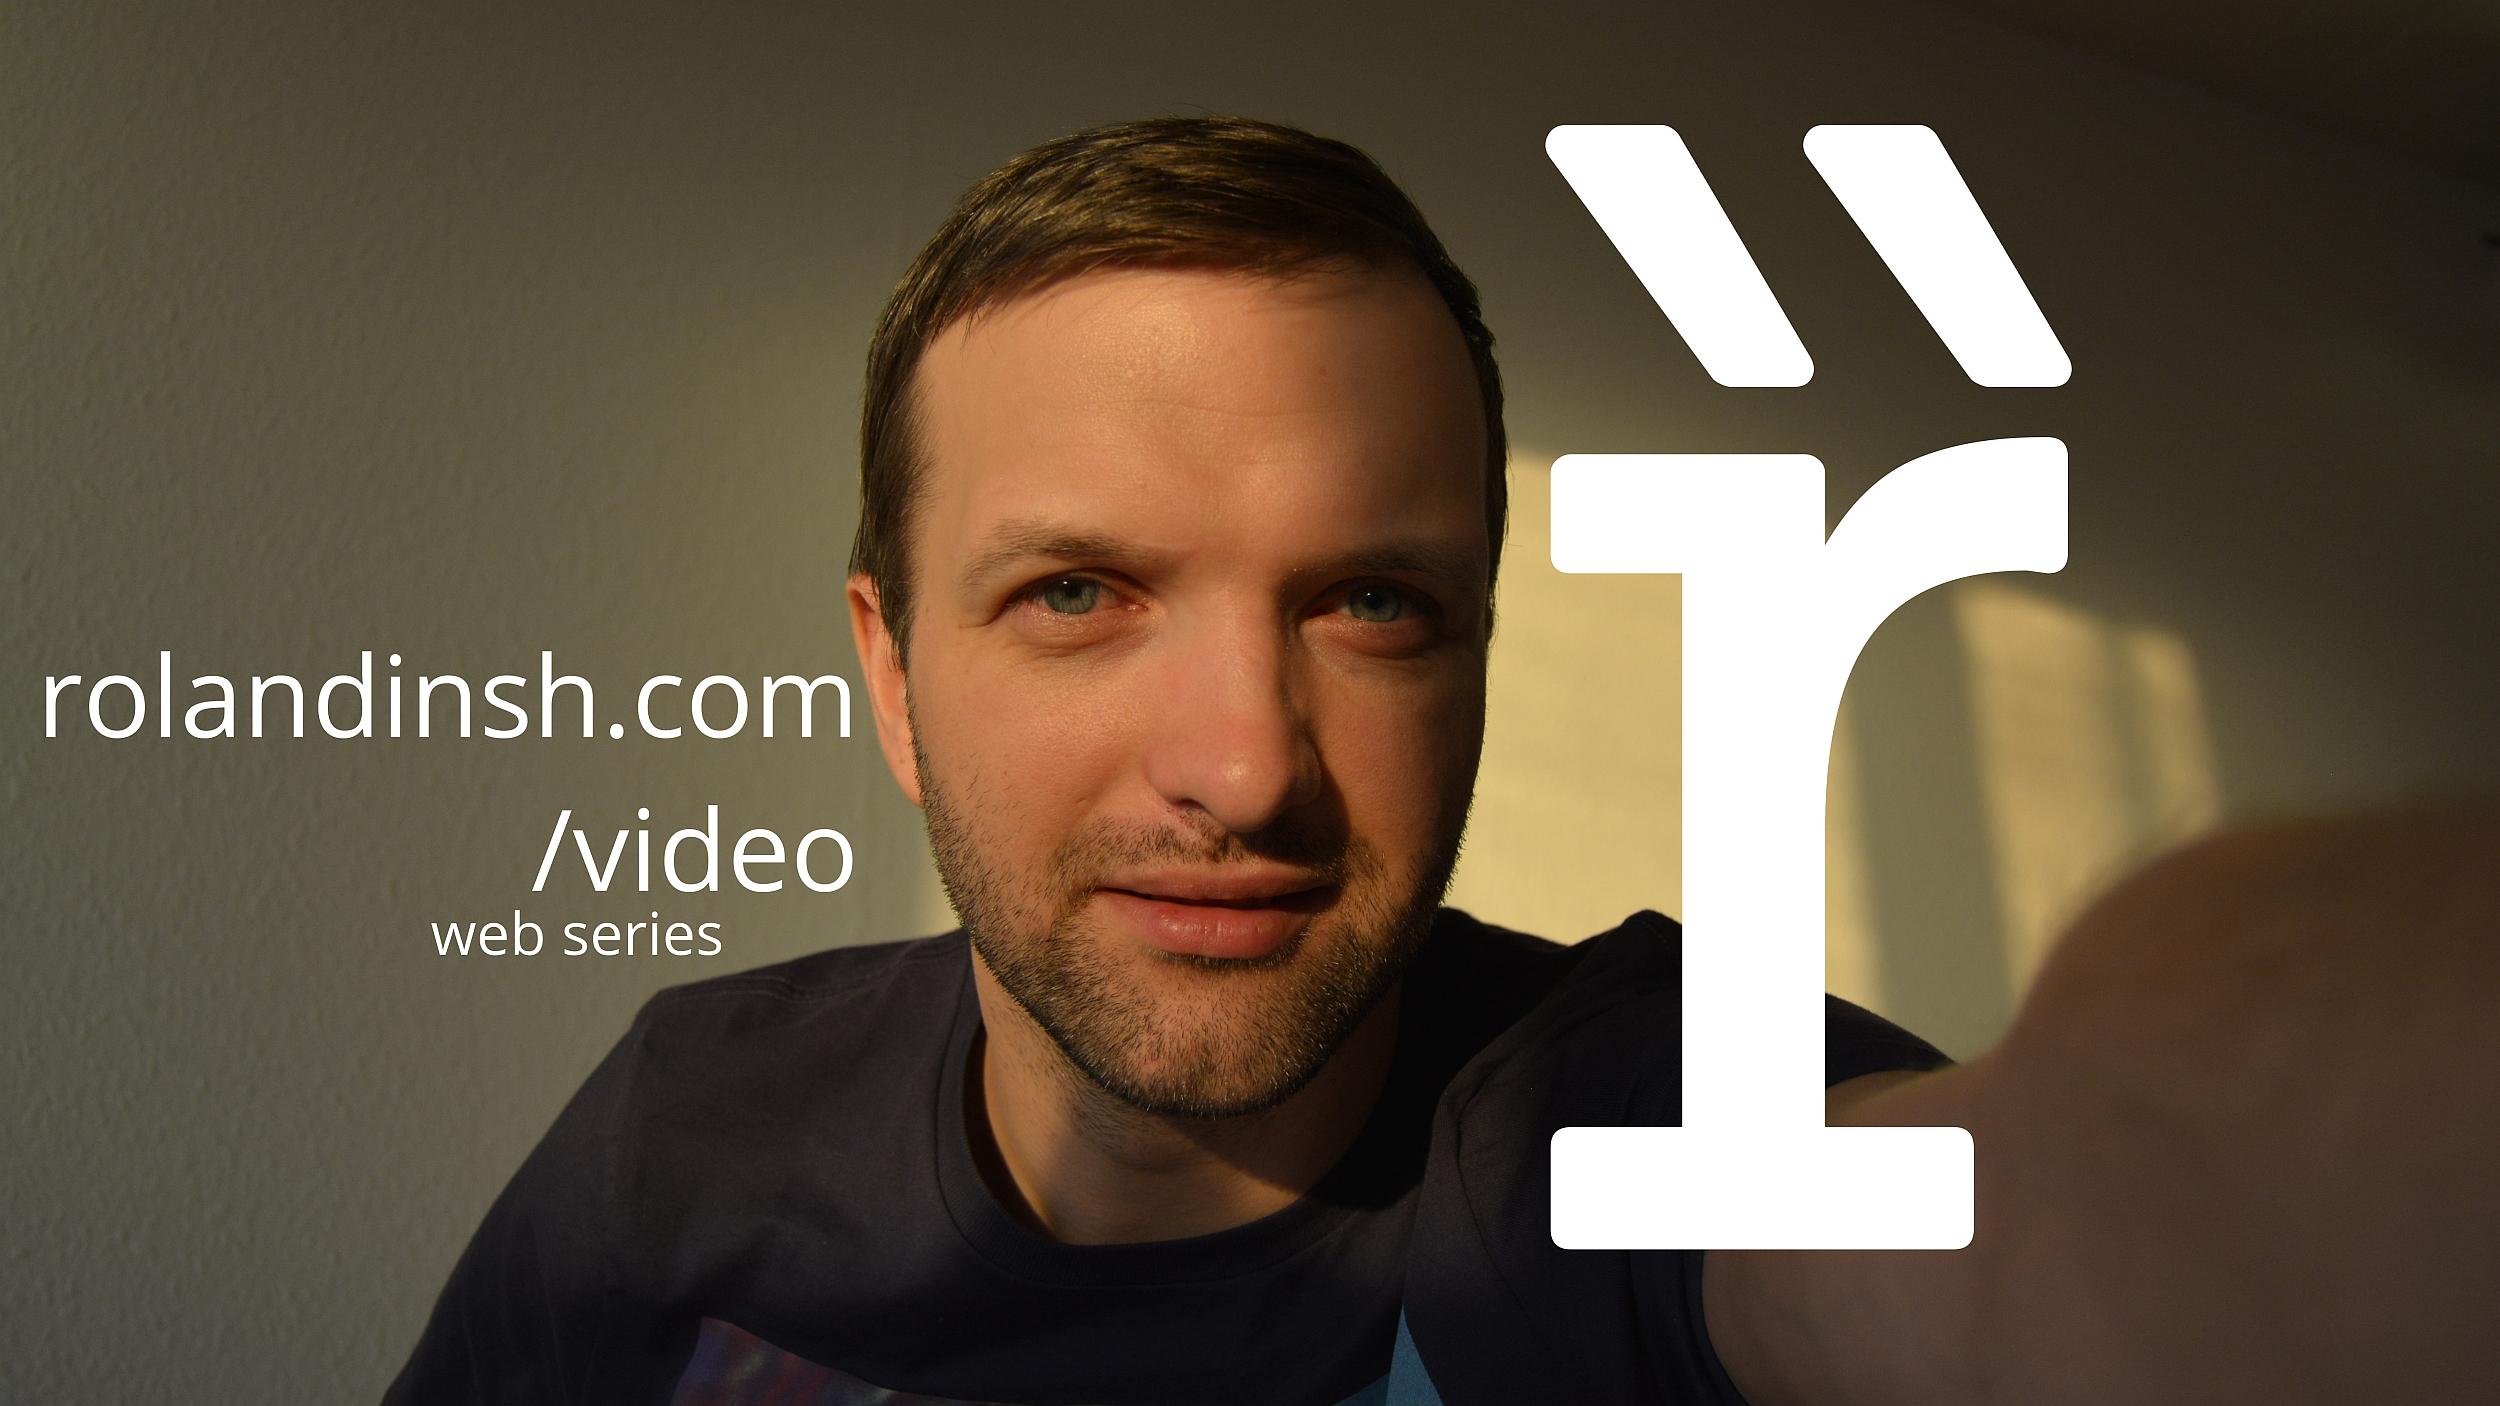 Let's start vlog! (#1)